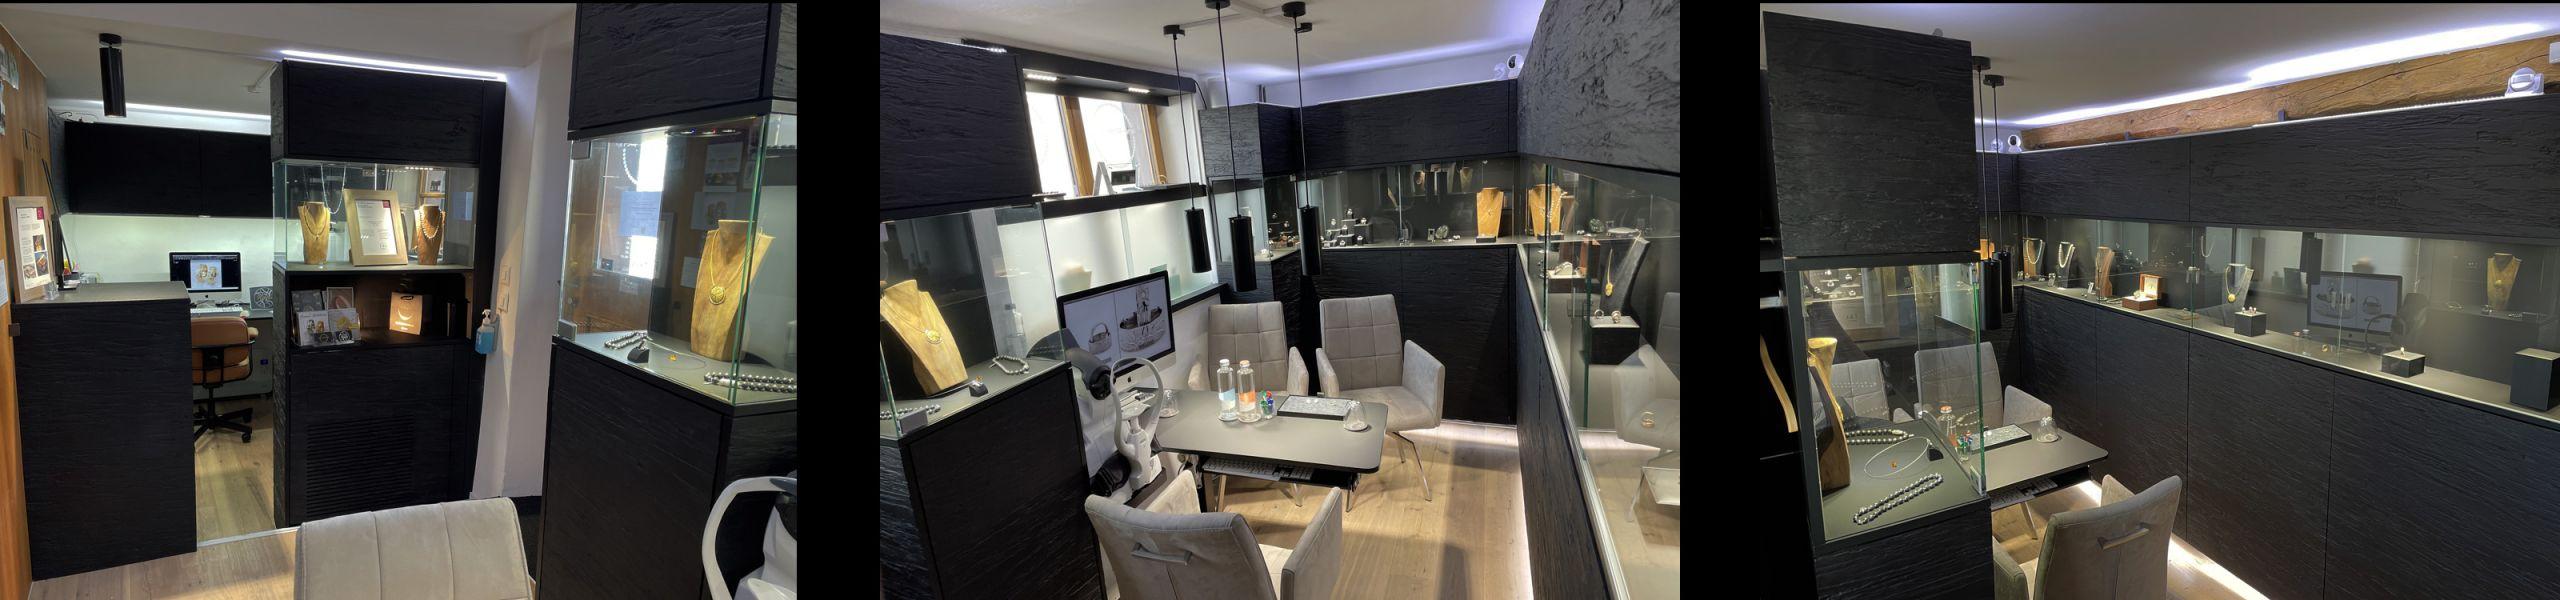 RetinaJewelry-Lounge-Atelier